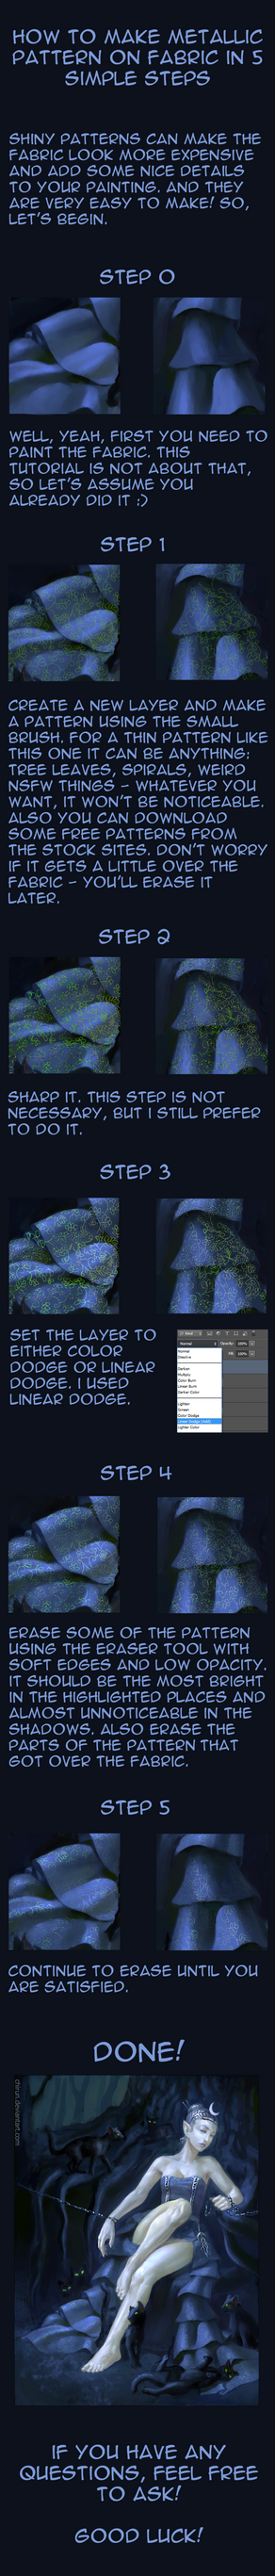 Easy way to draw metallic pattern on fabric by chirun